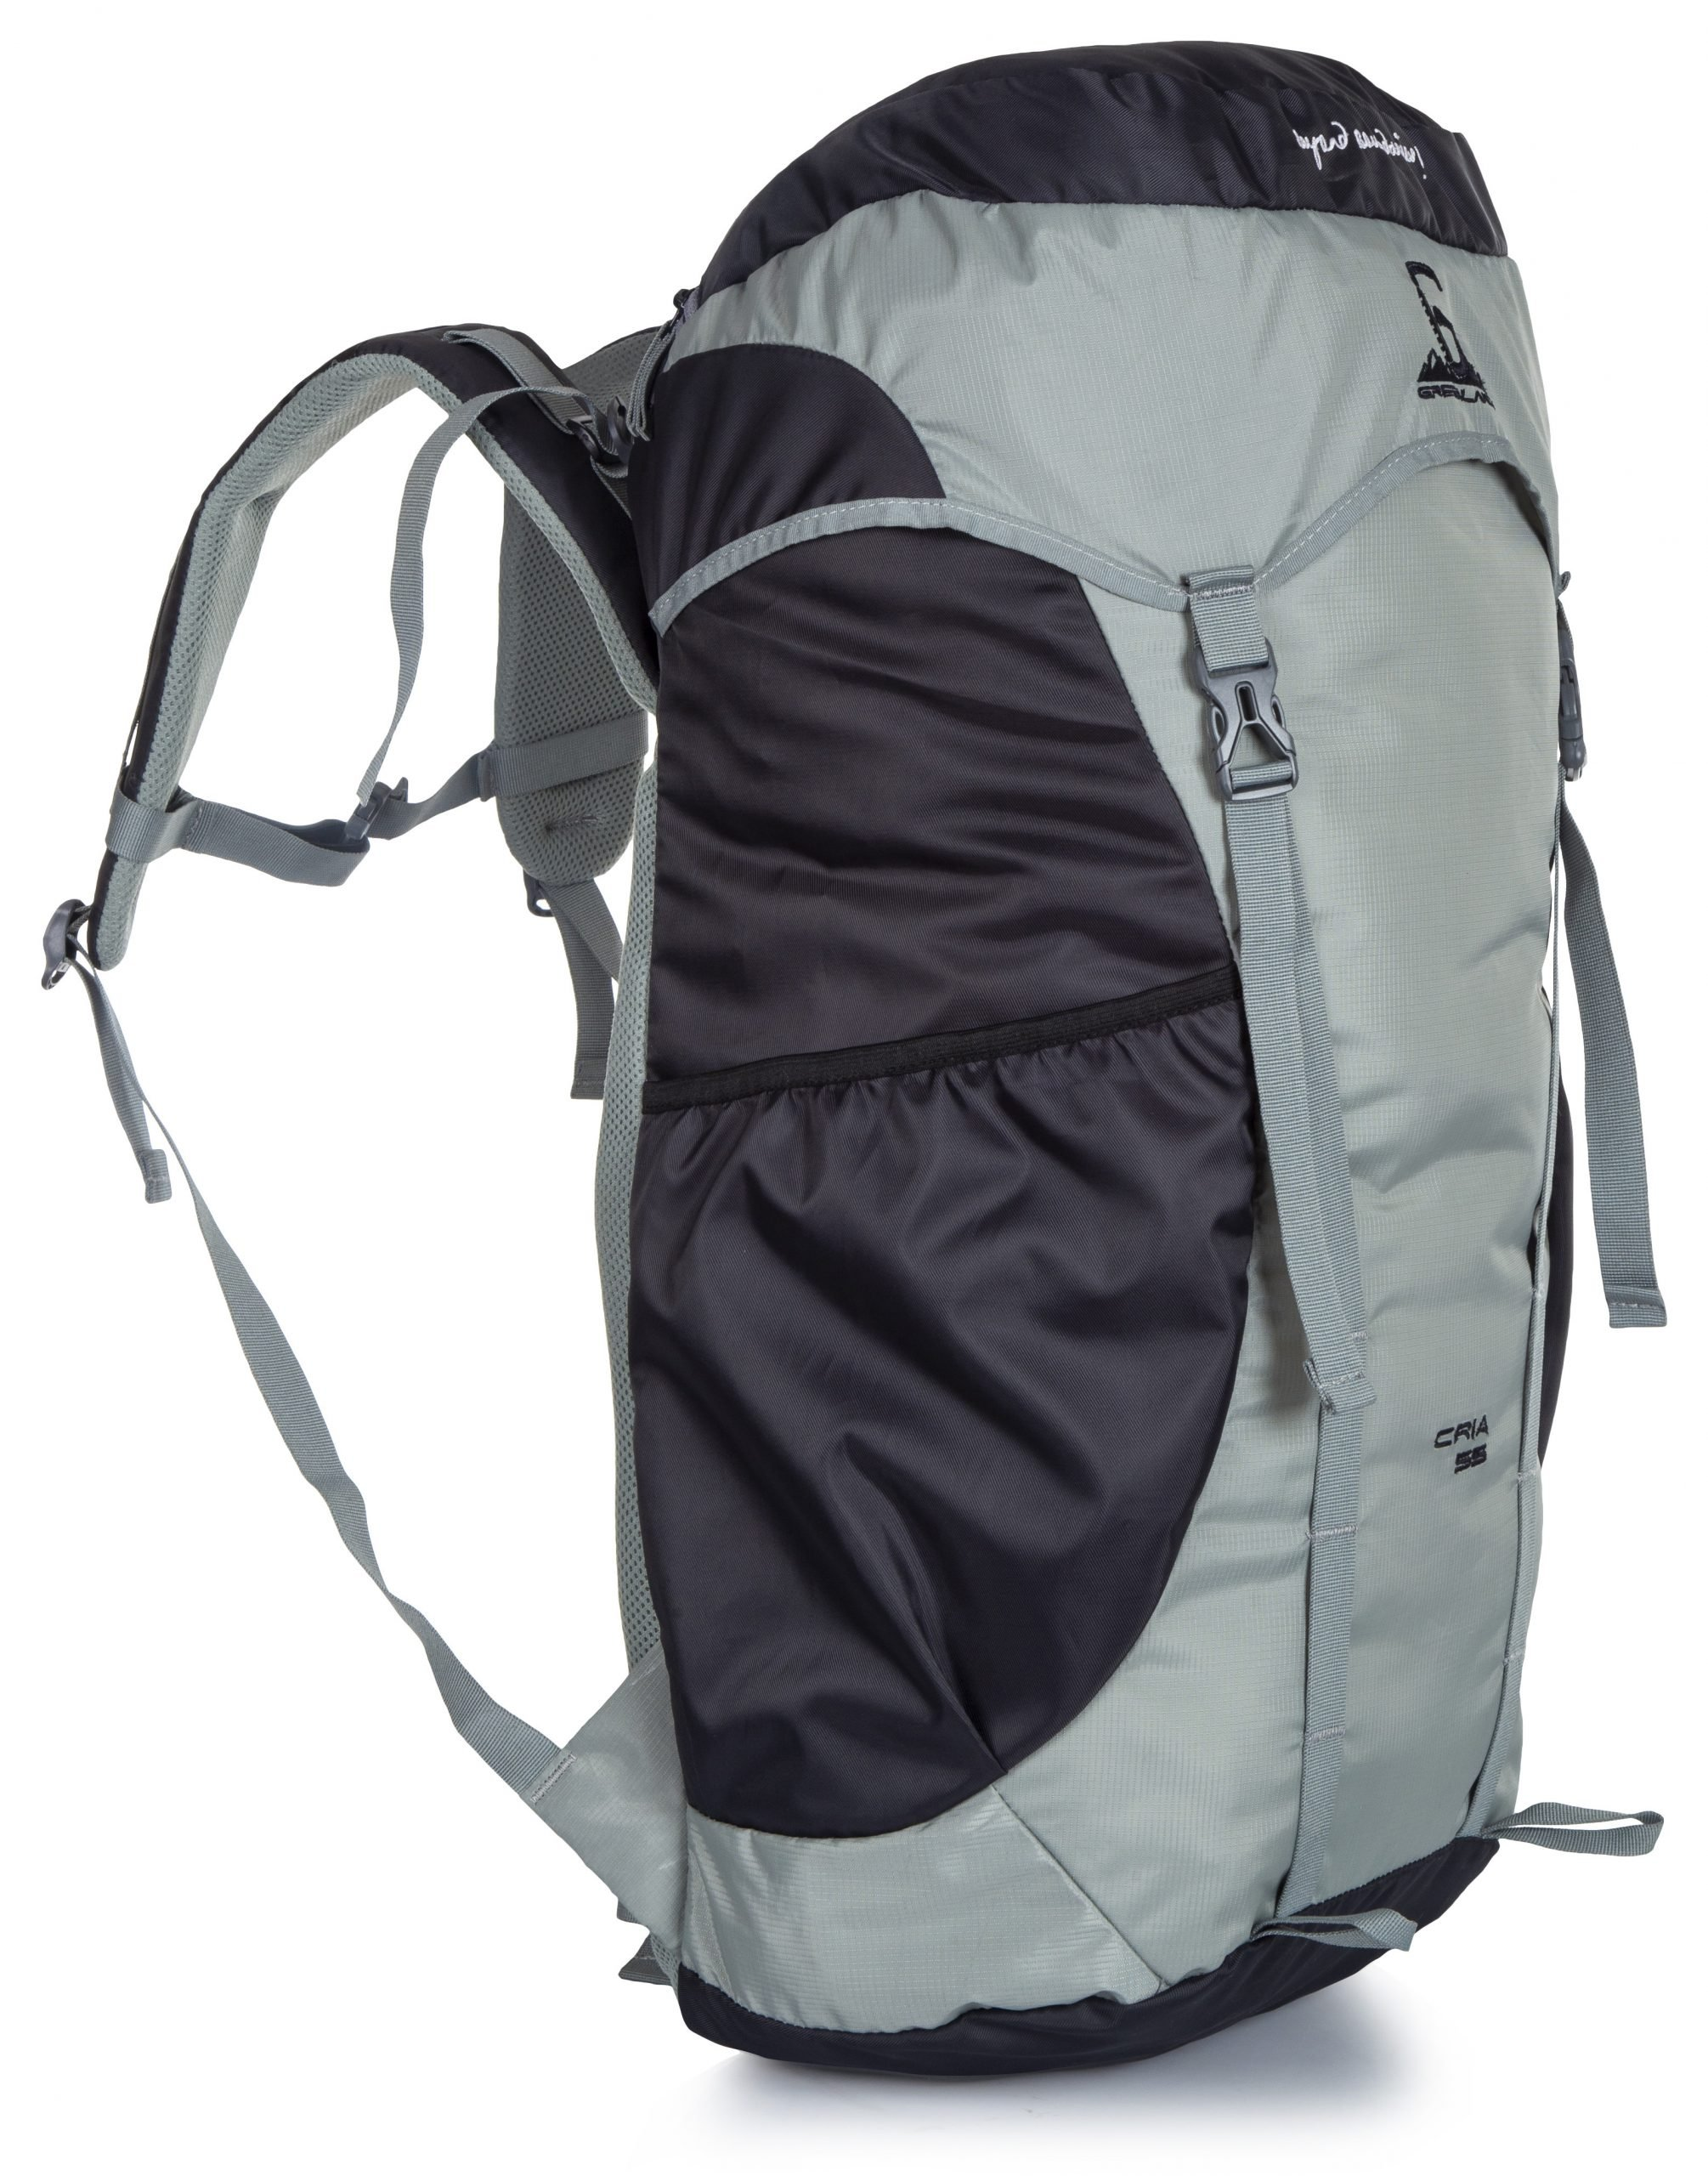 Greenlands Cria 55 Backpack